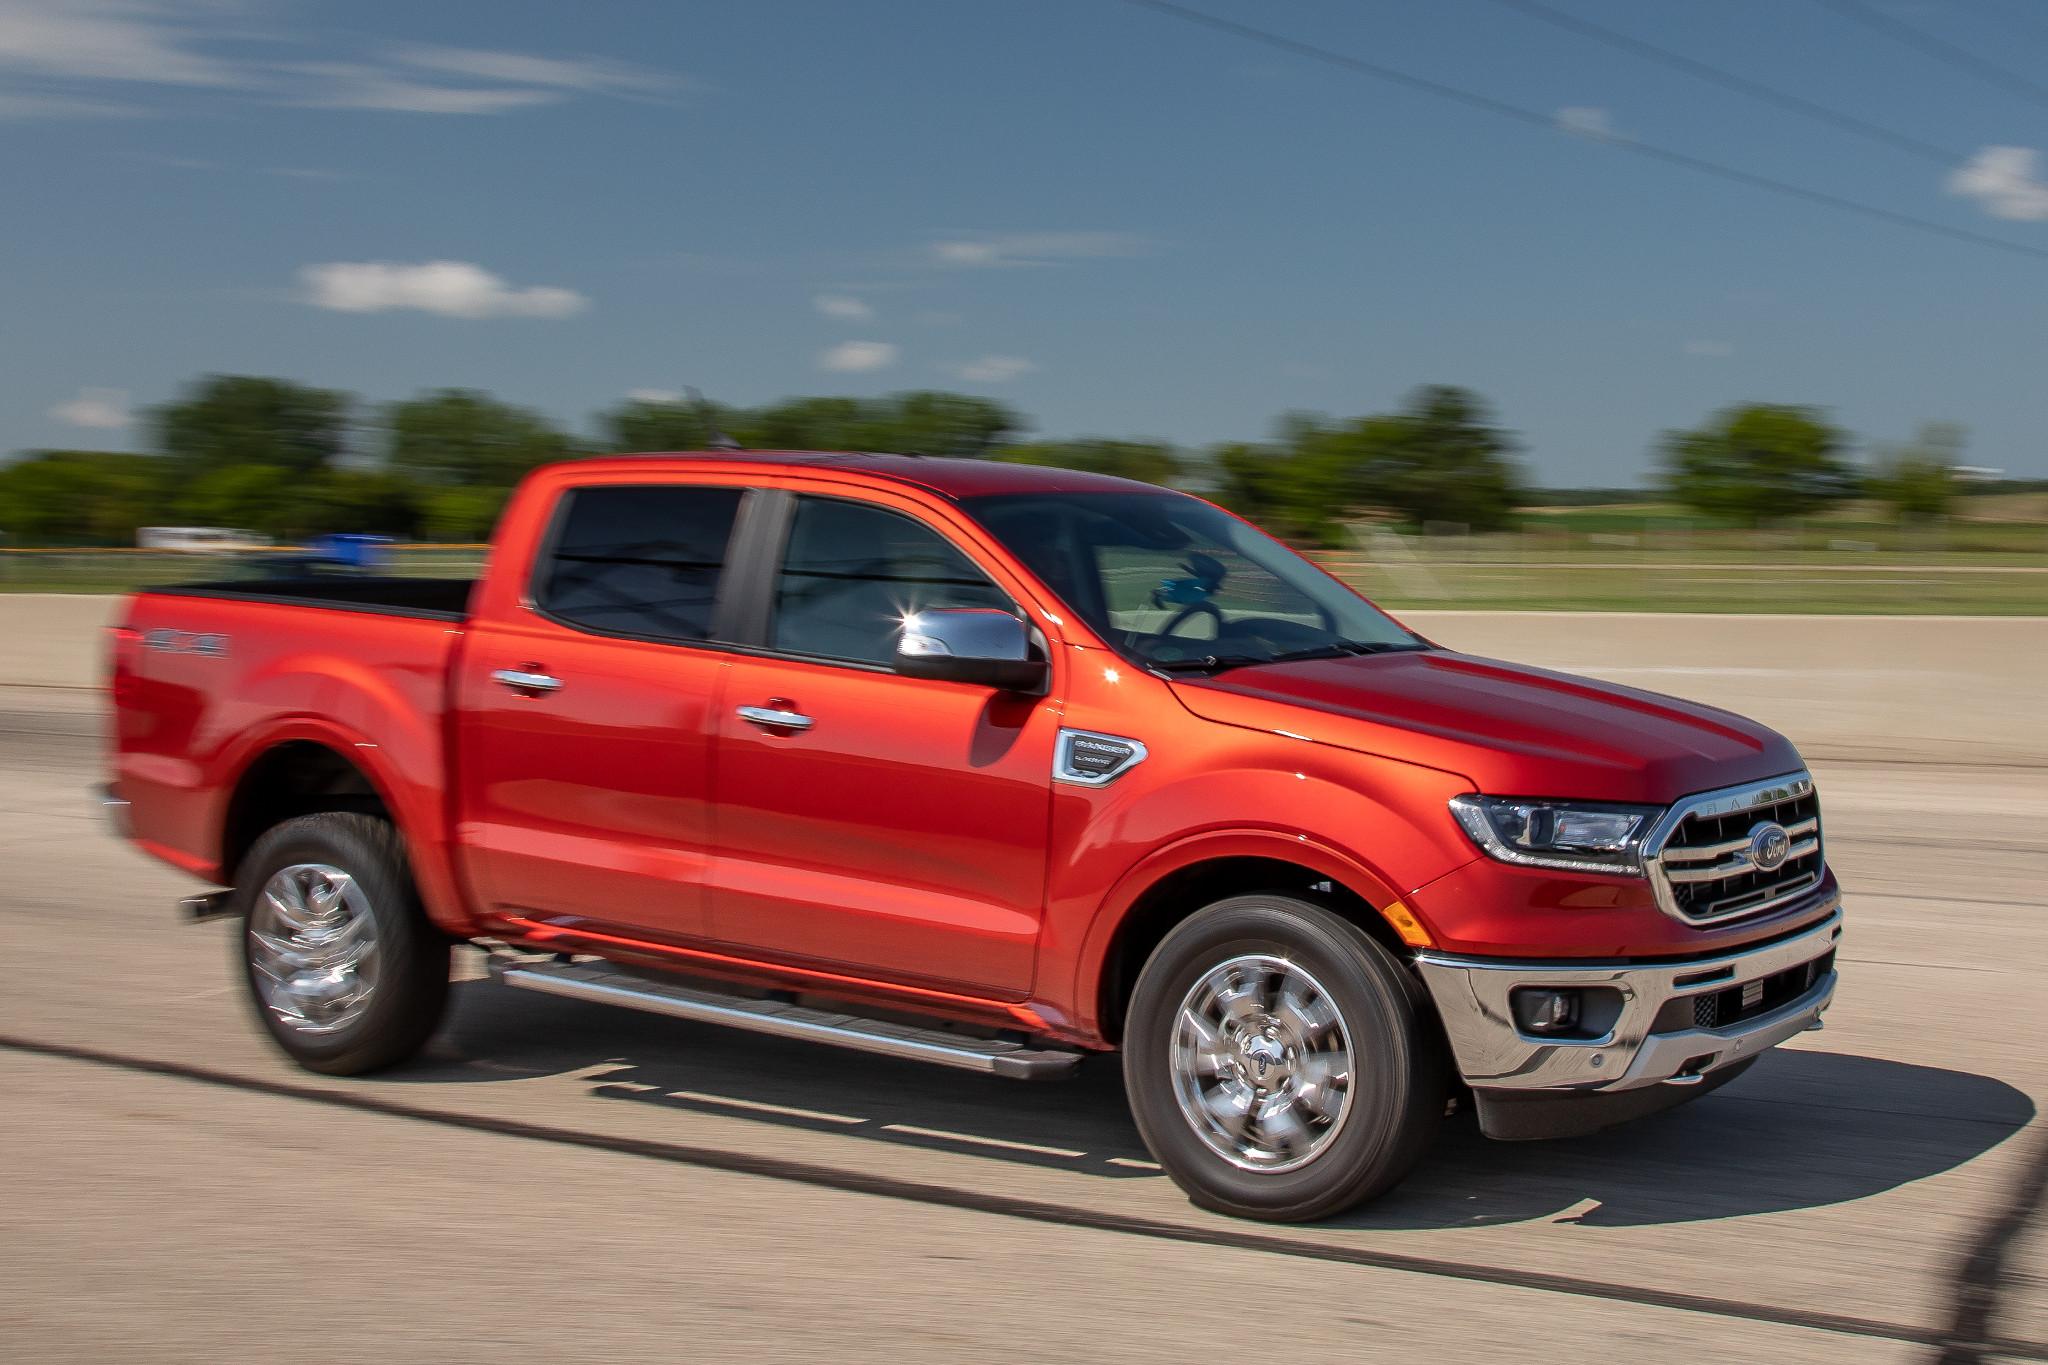 Kelebihan Kekurangan Toyota Ranger Review